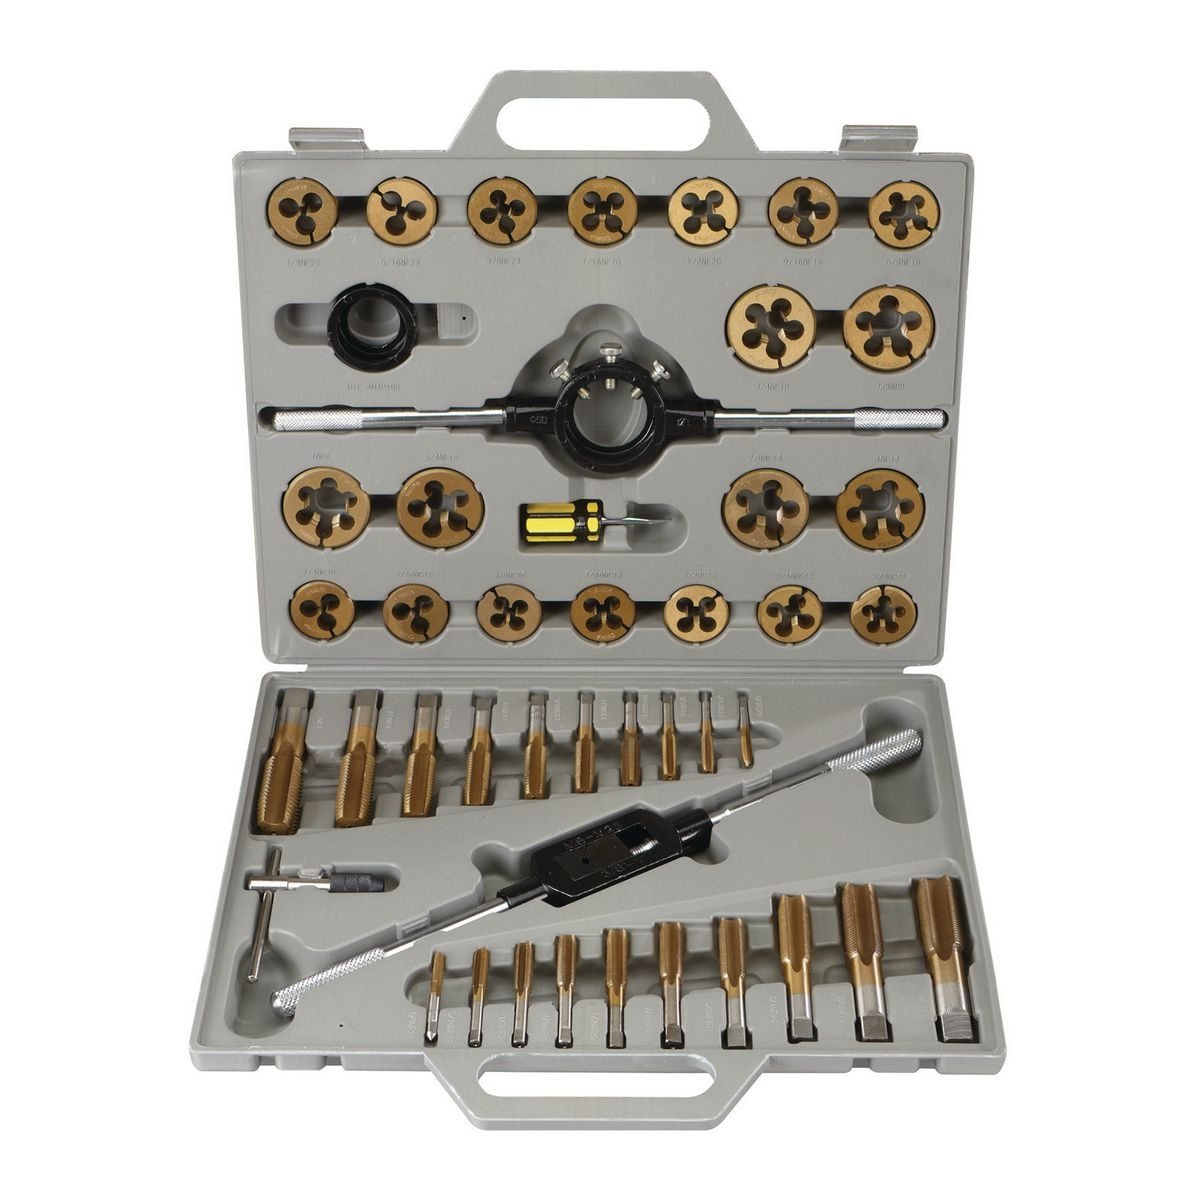 PITTSBURGH Titanium Nitride Coated Alloy Steel SAE Tap & Die Set 45 Pc. - Item 61411 / 41451 / 60685